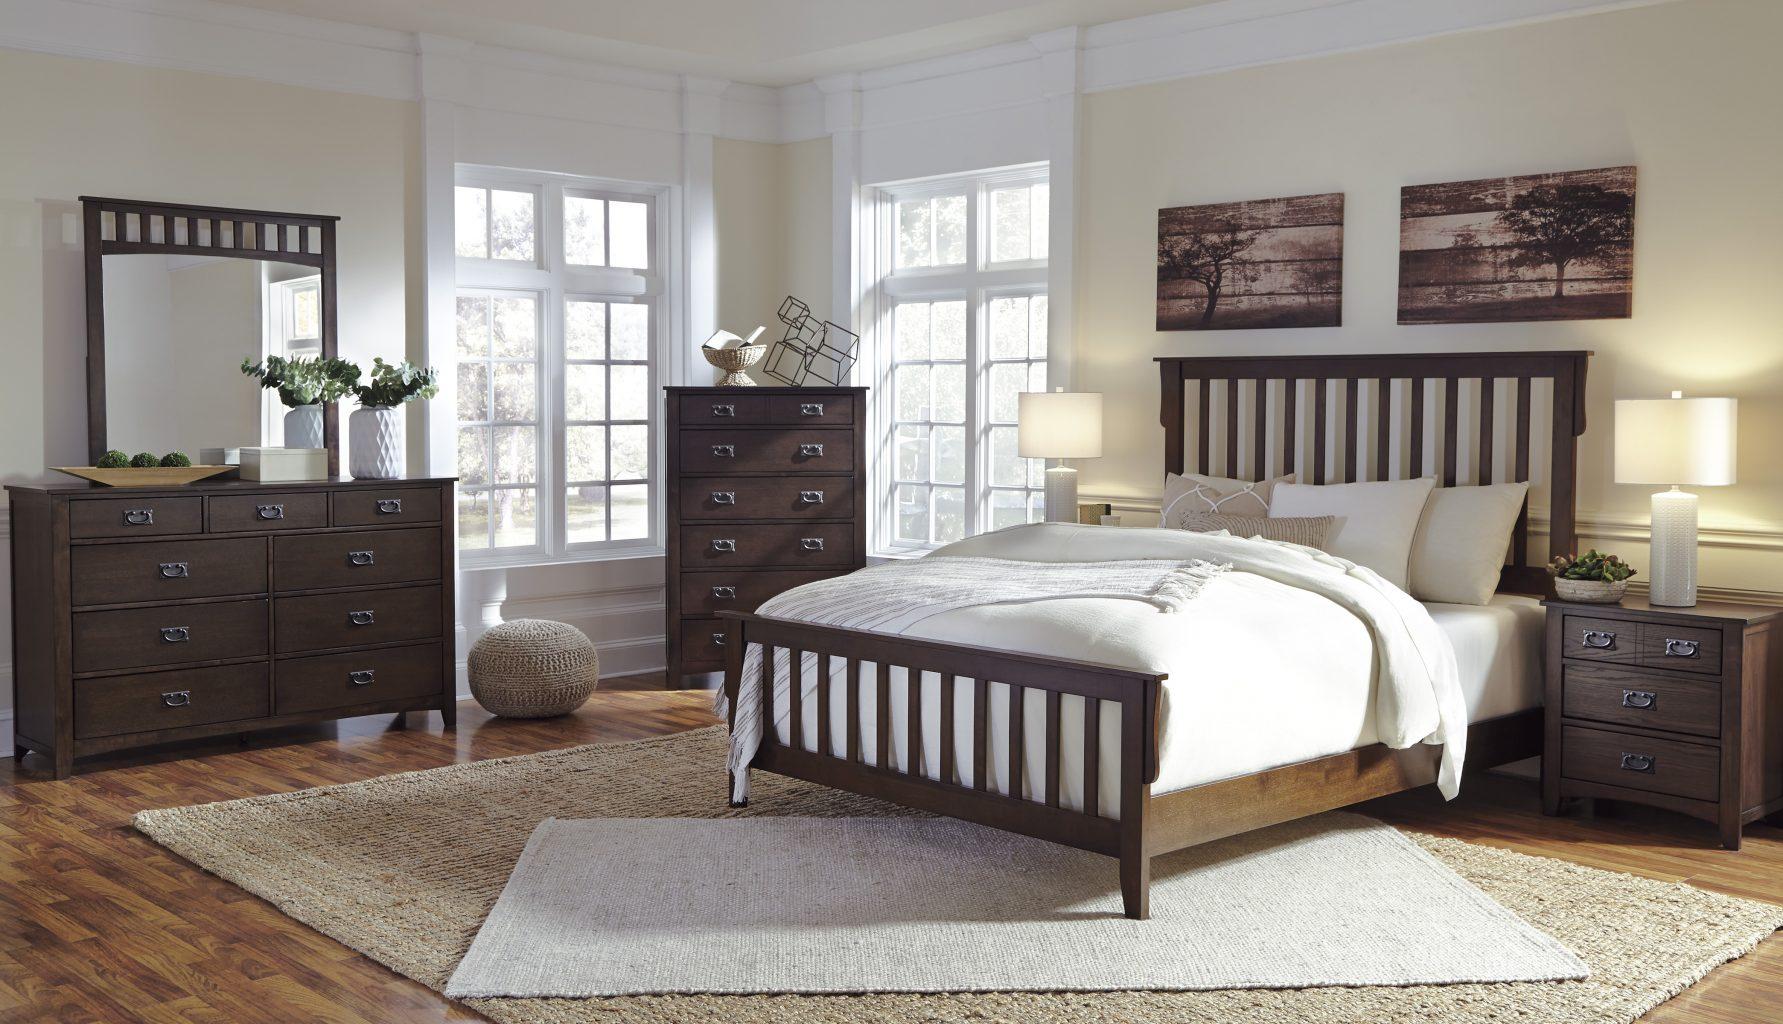 8 Piece Bedroom Set – Strenton by Ashley Furniture